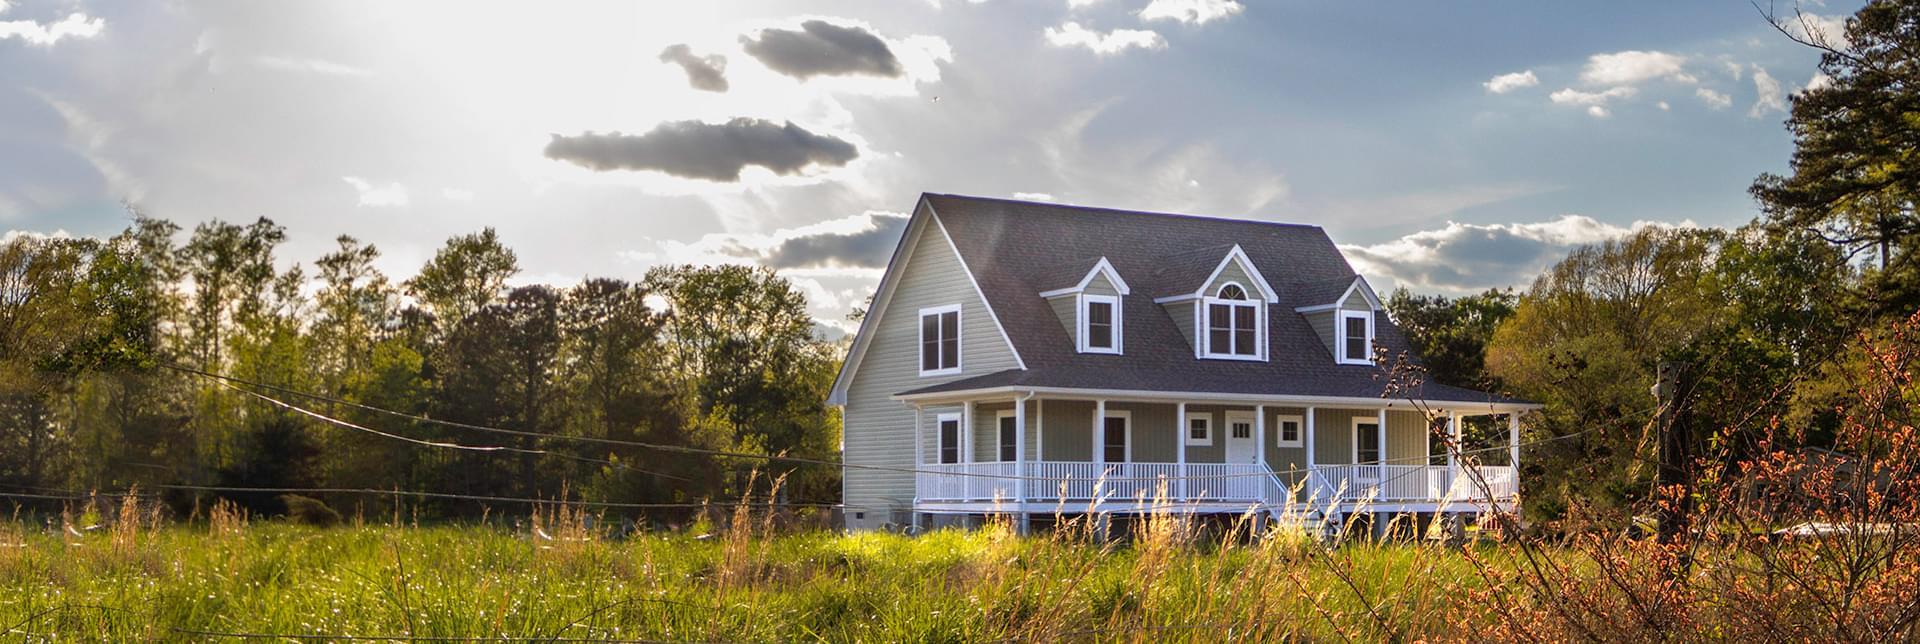 New Homes in Washington County NC